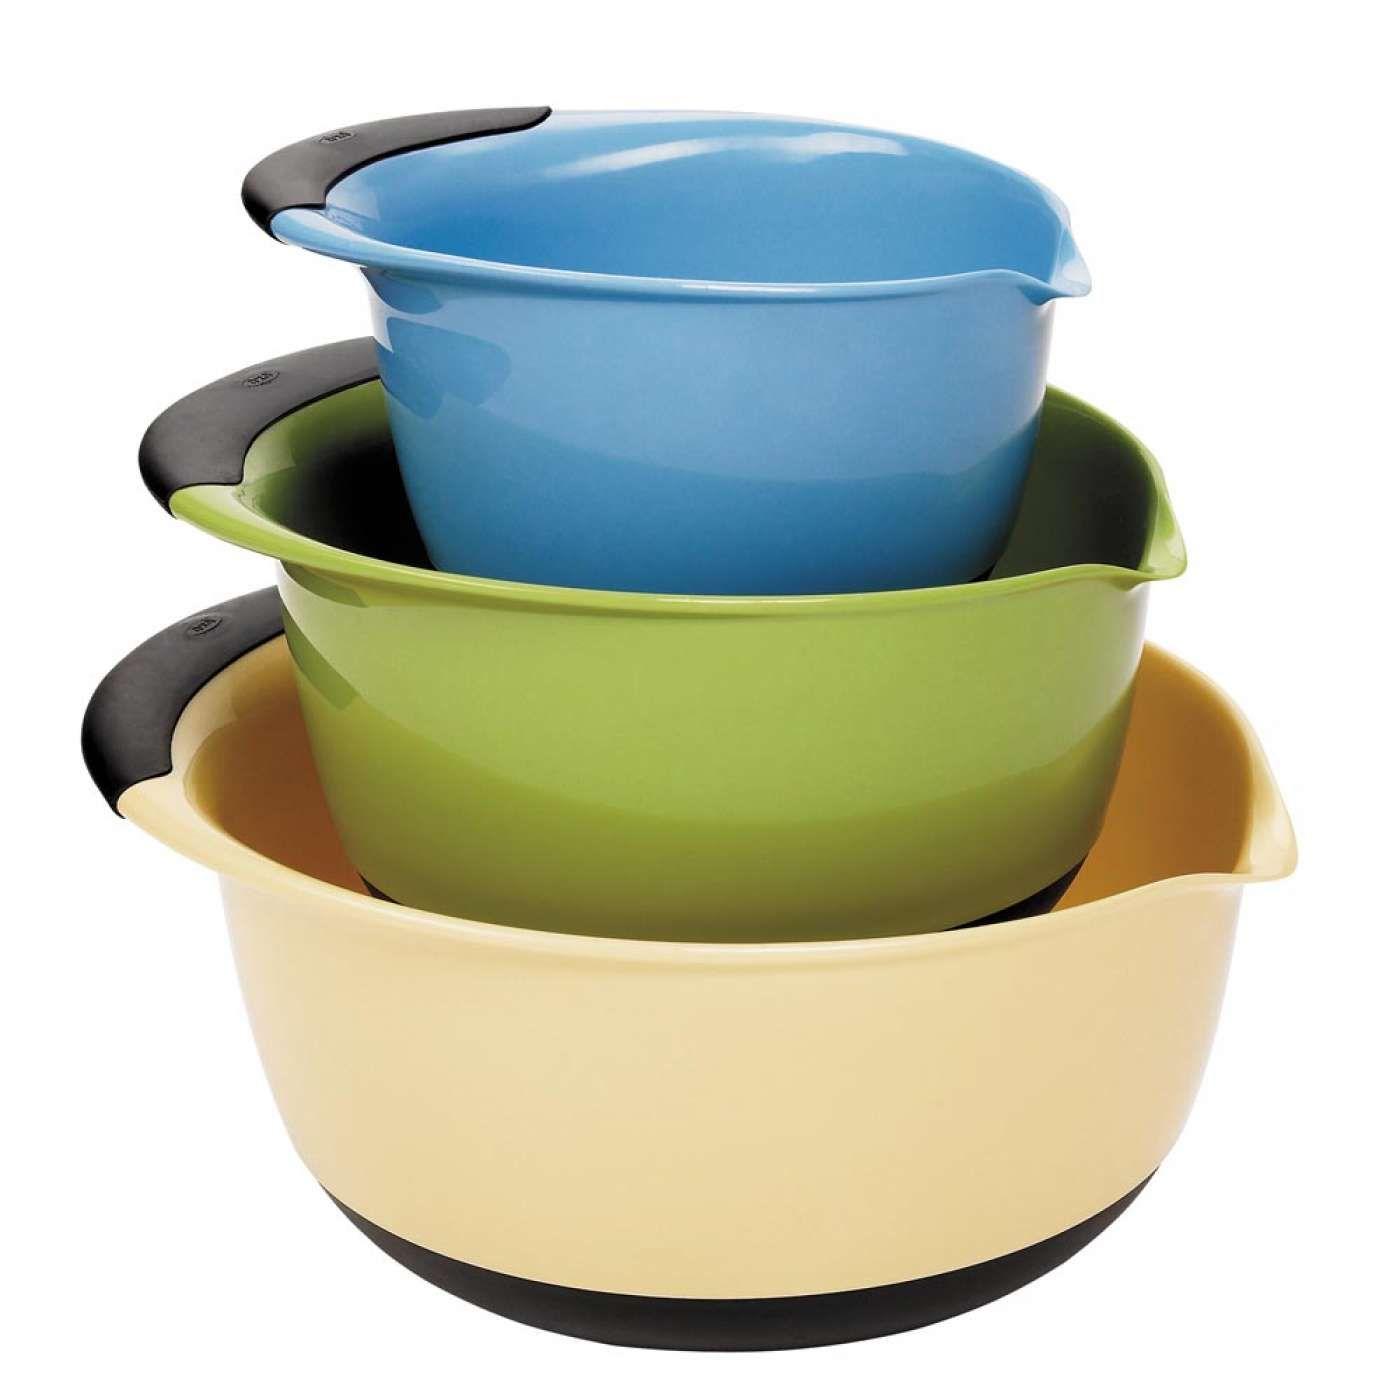 3-Piece Mixing Bowl Set - Assorted Colors